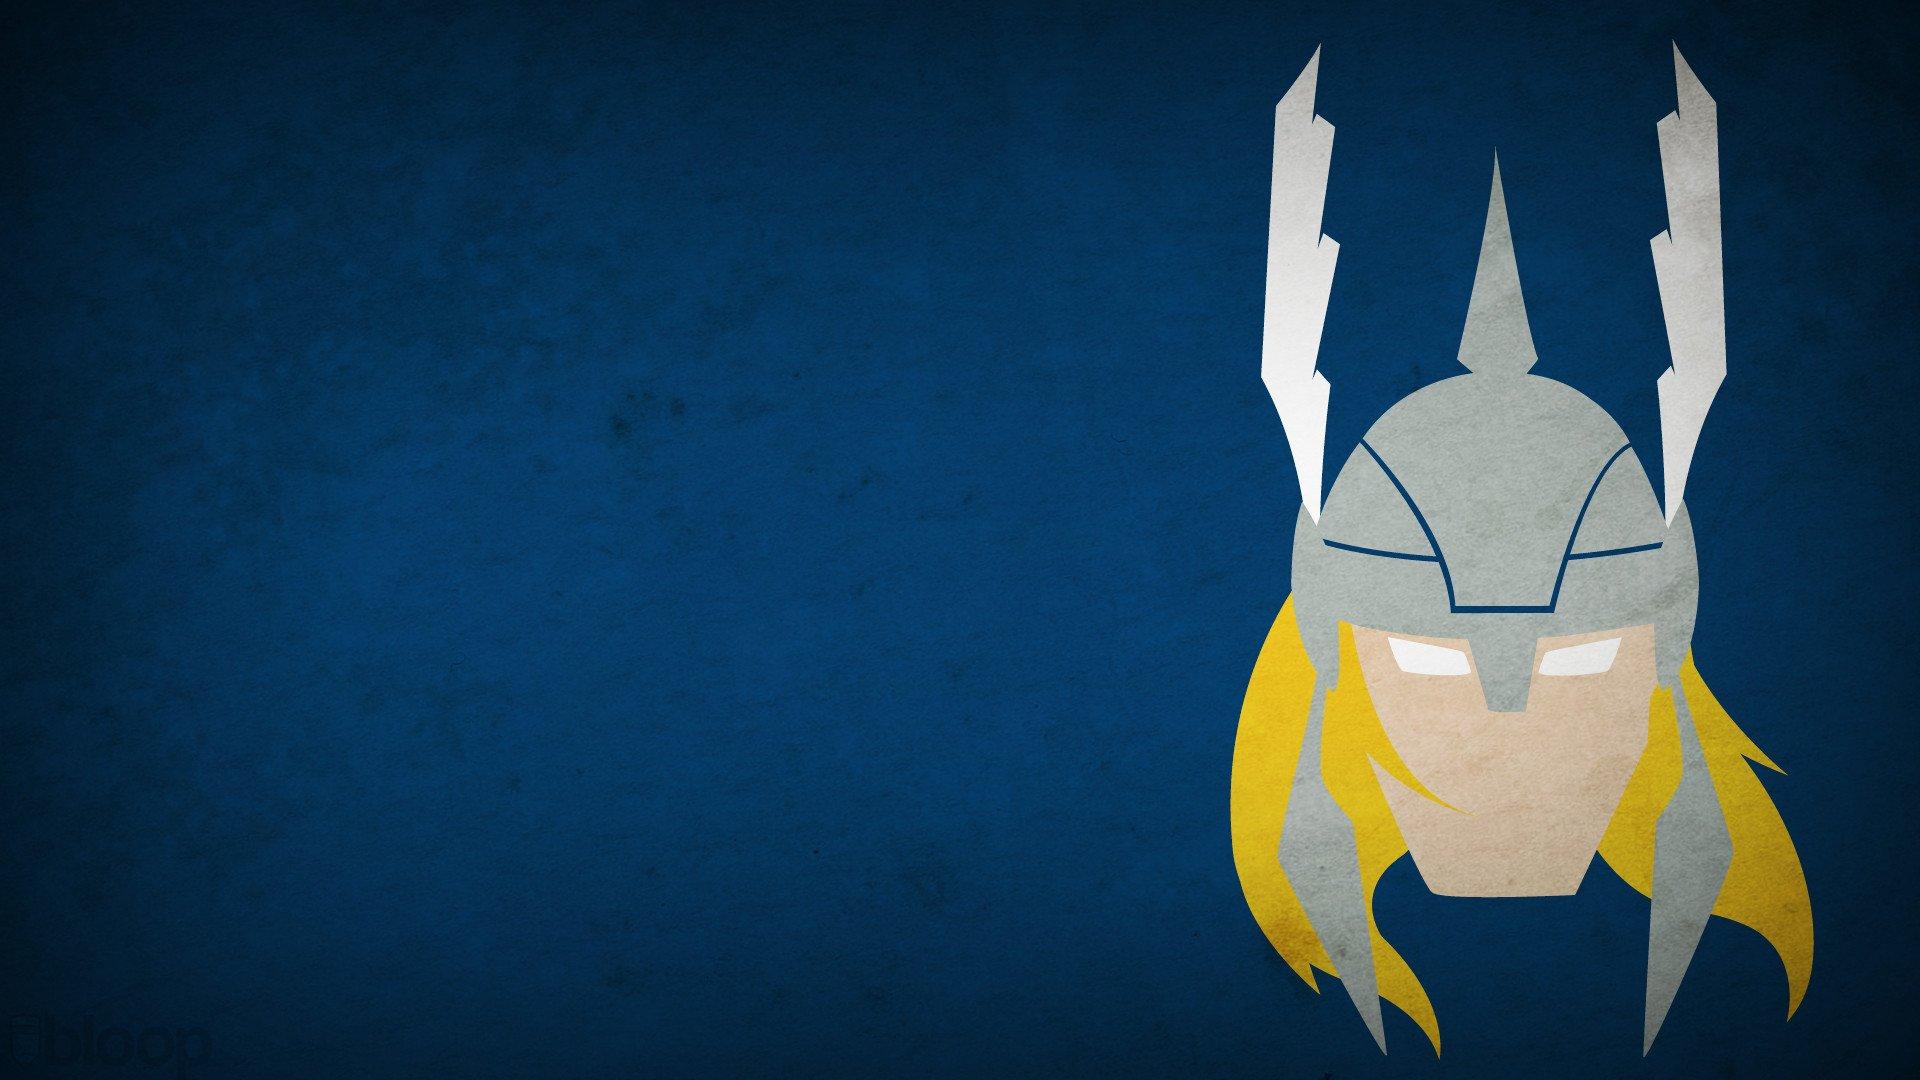 Free Thor Wallpaper HD for Desktop